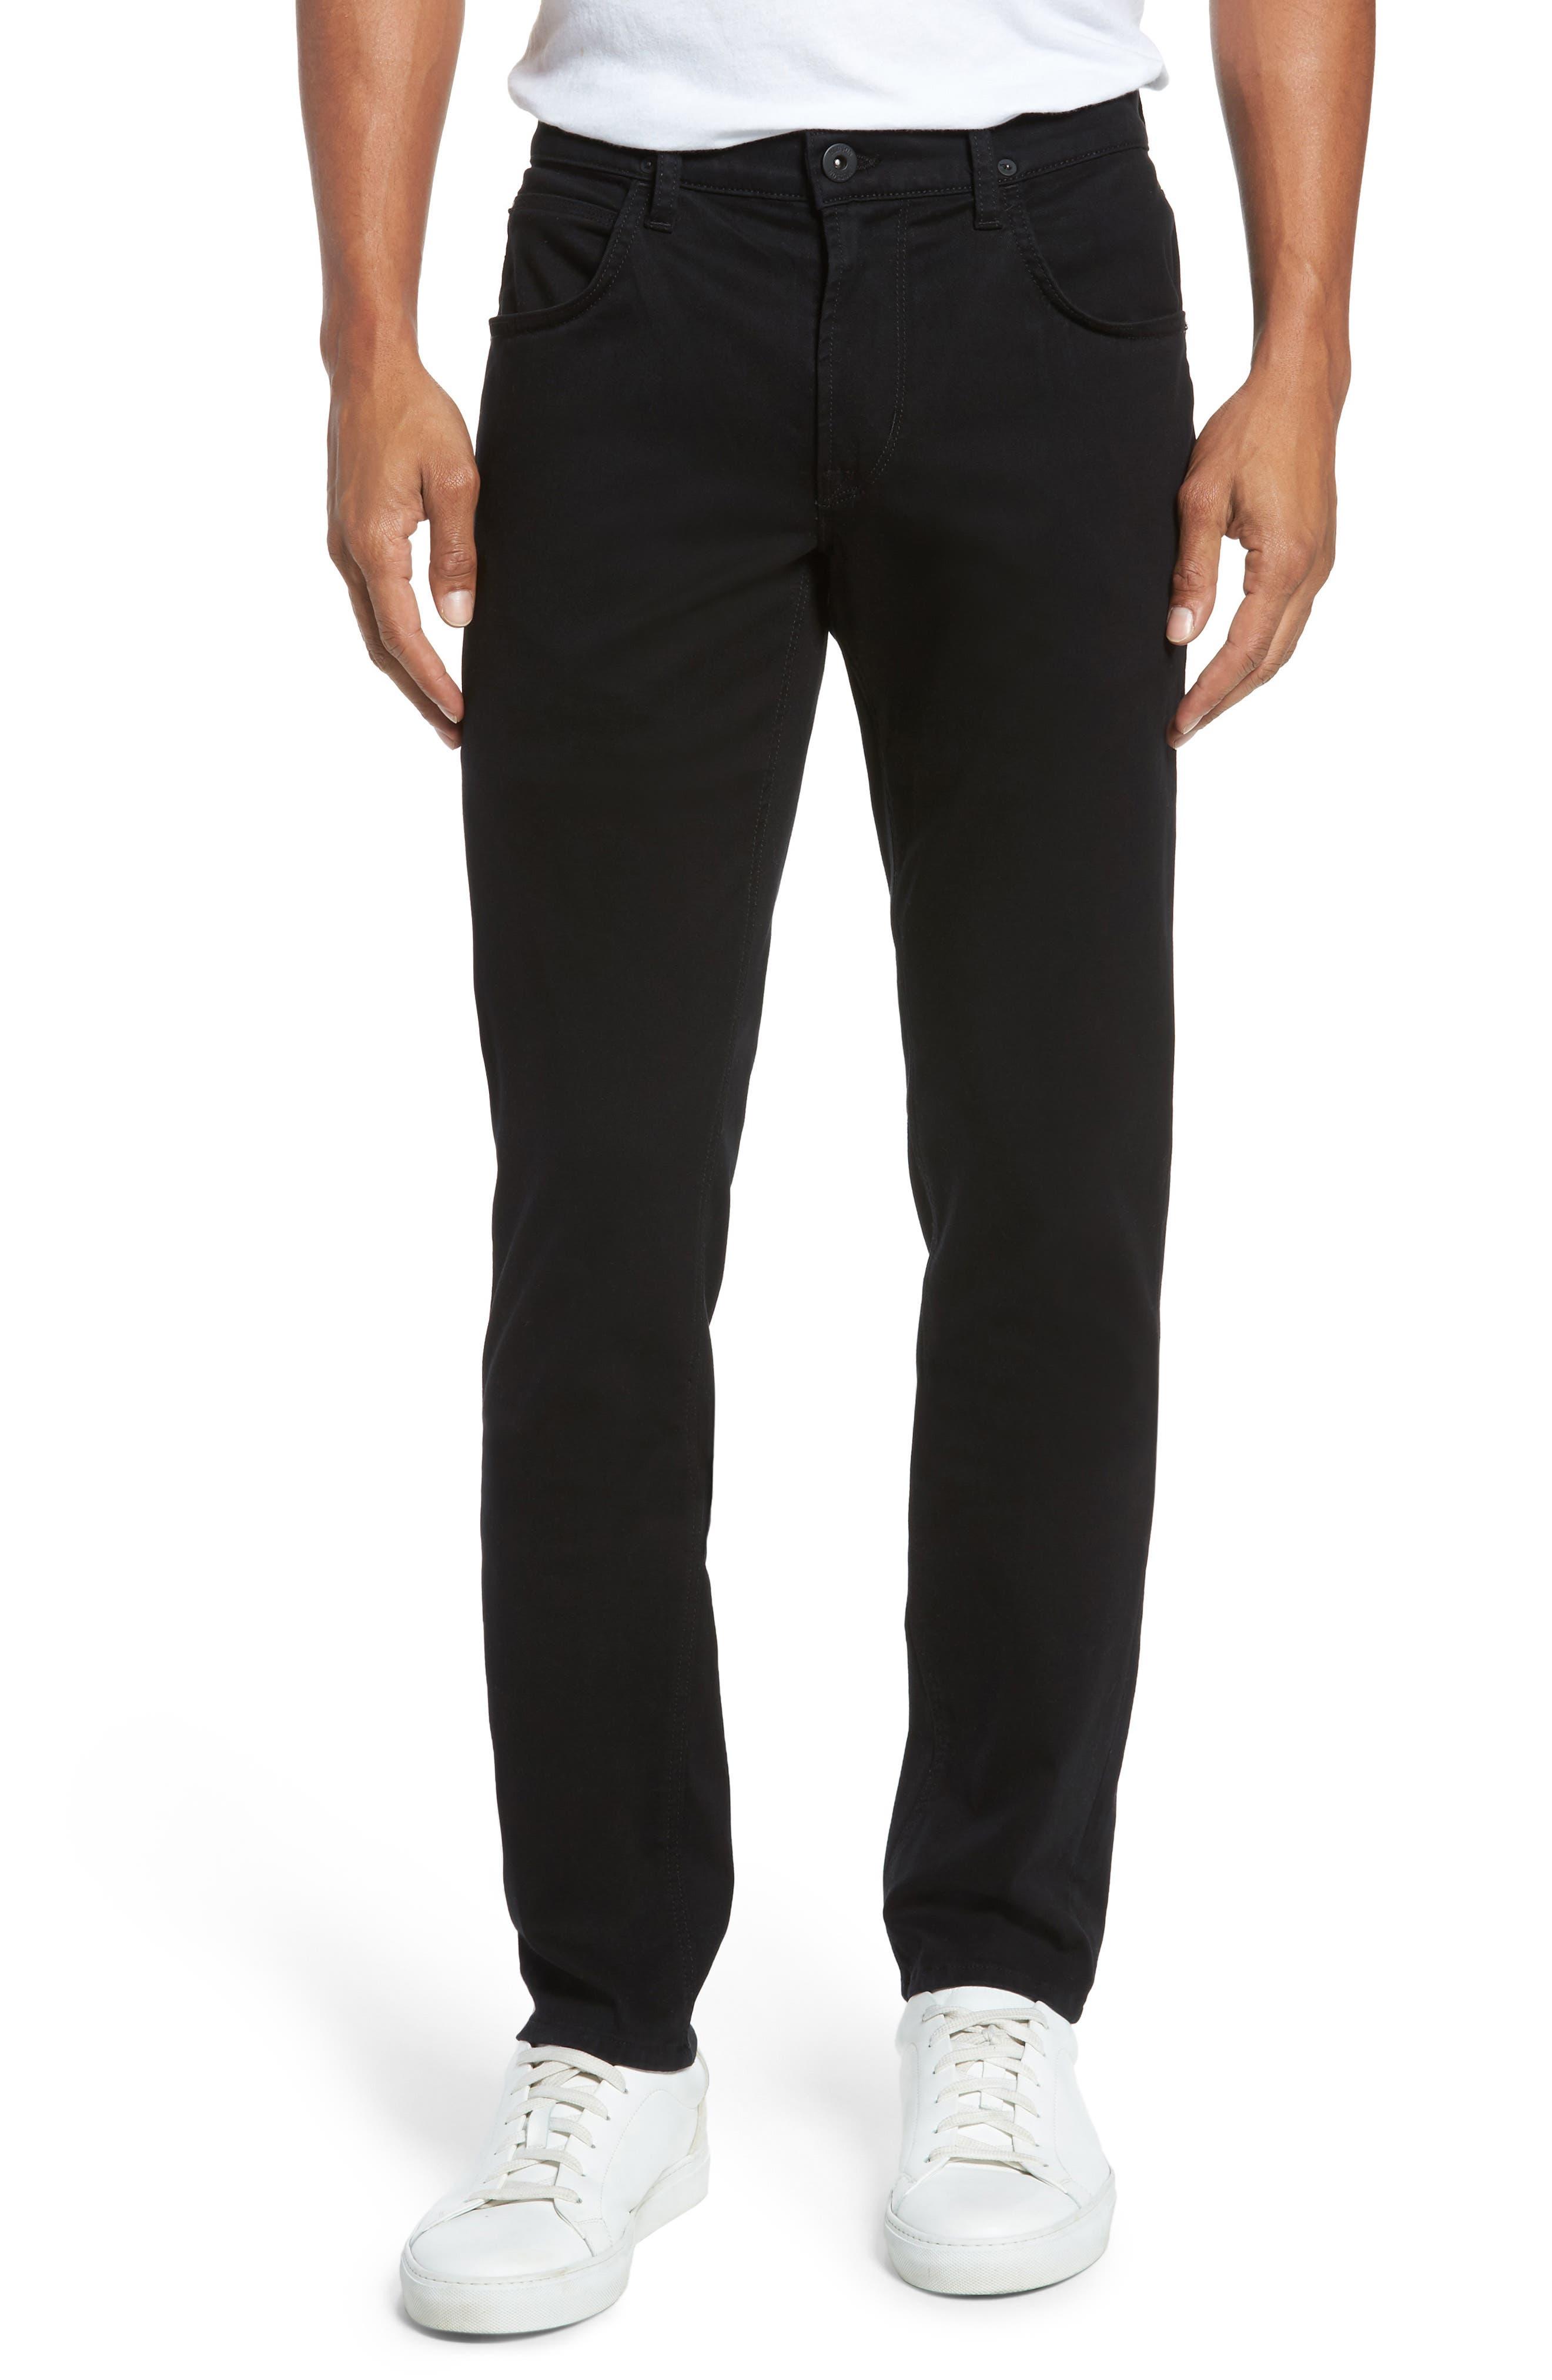 Blake Slim Fit Jeans,                             Main thumbnail 1, color,                             Blackened